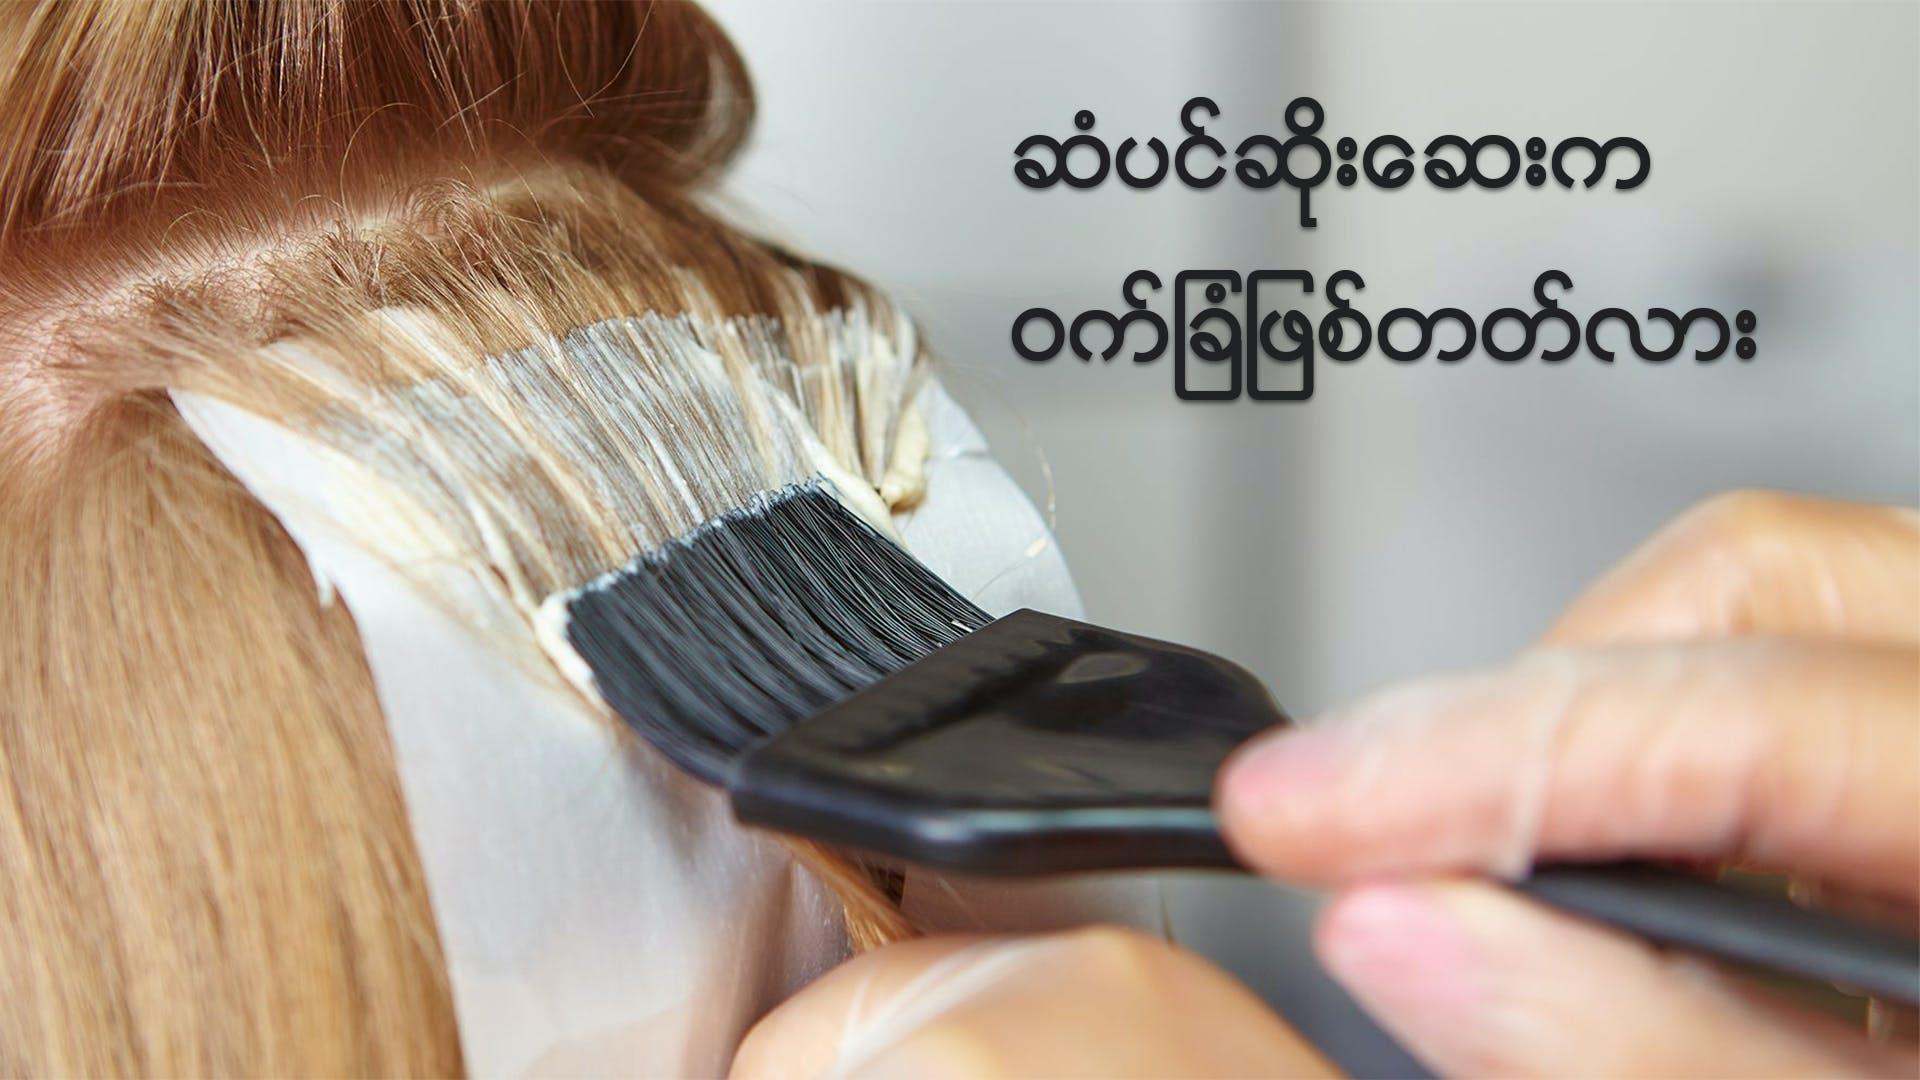 Haircare product တွေက Breakout ဖြစ်စေတတ်လား